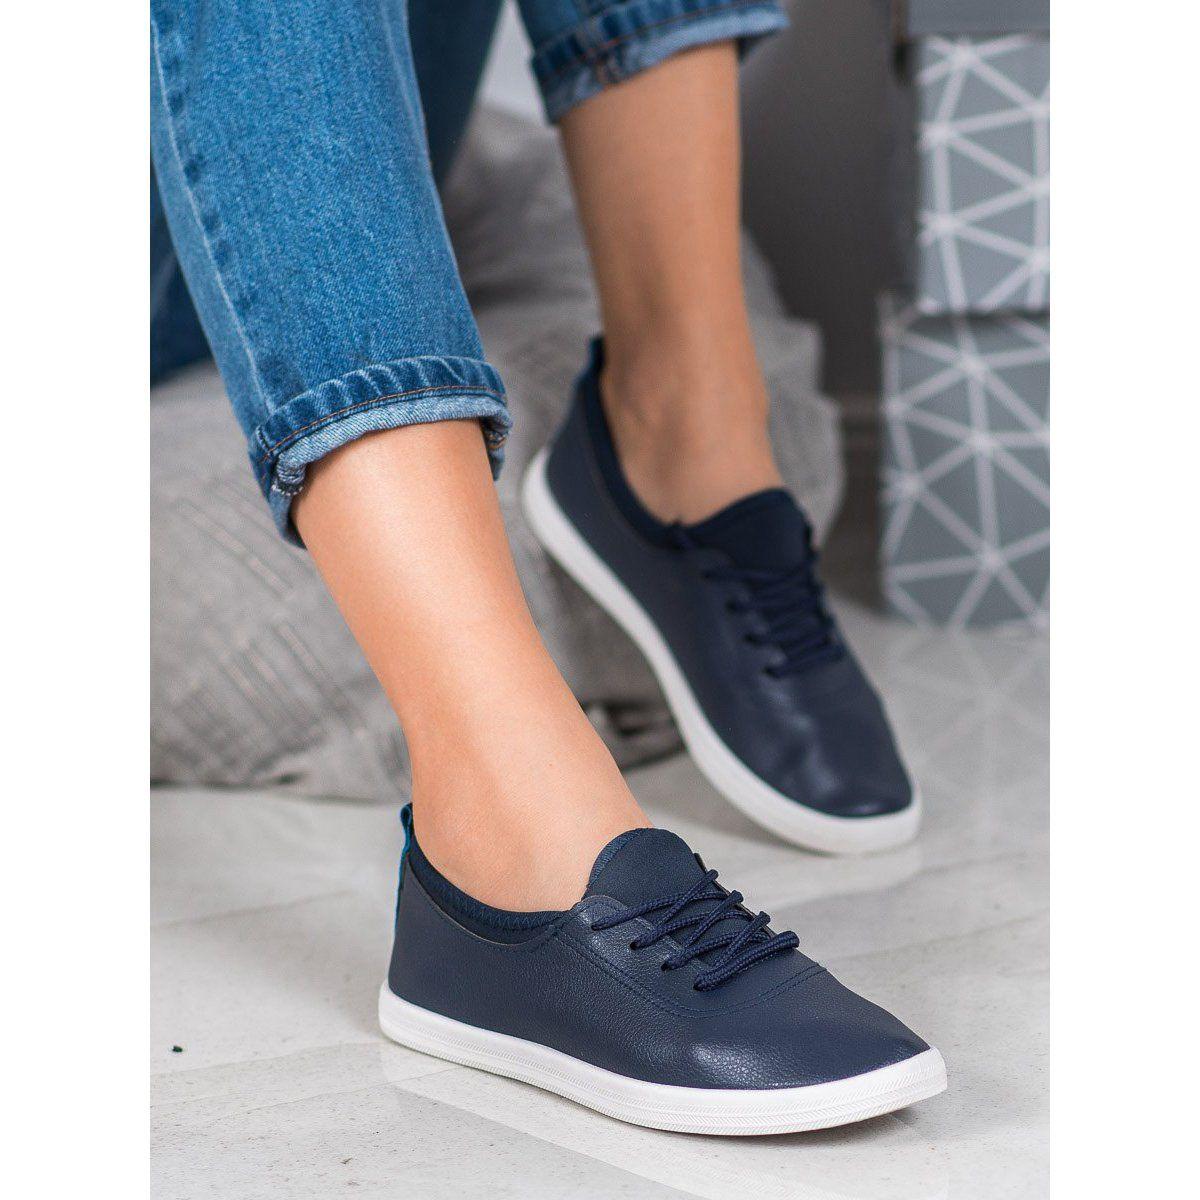 Shelovet Lekkie Trampki Z Eko Skory Niebieskie Dress Shoes Men Dress Shoes Shoes